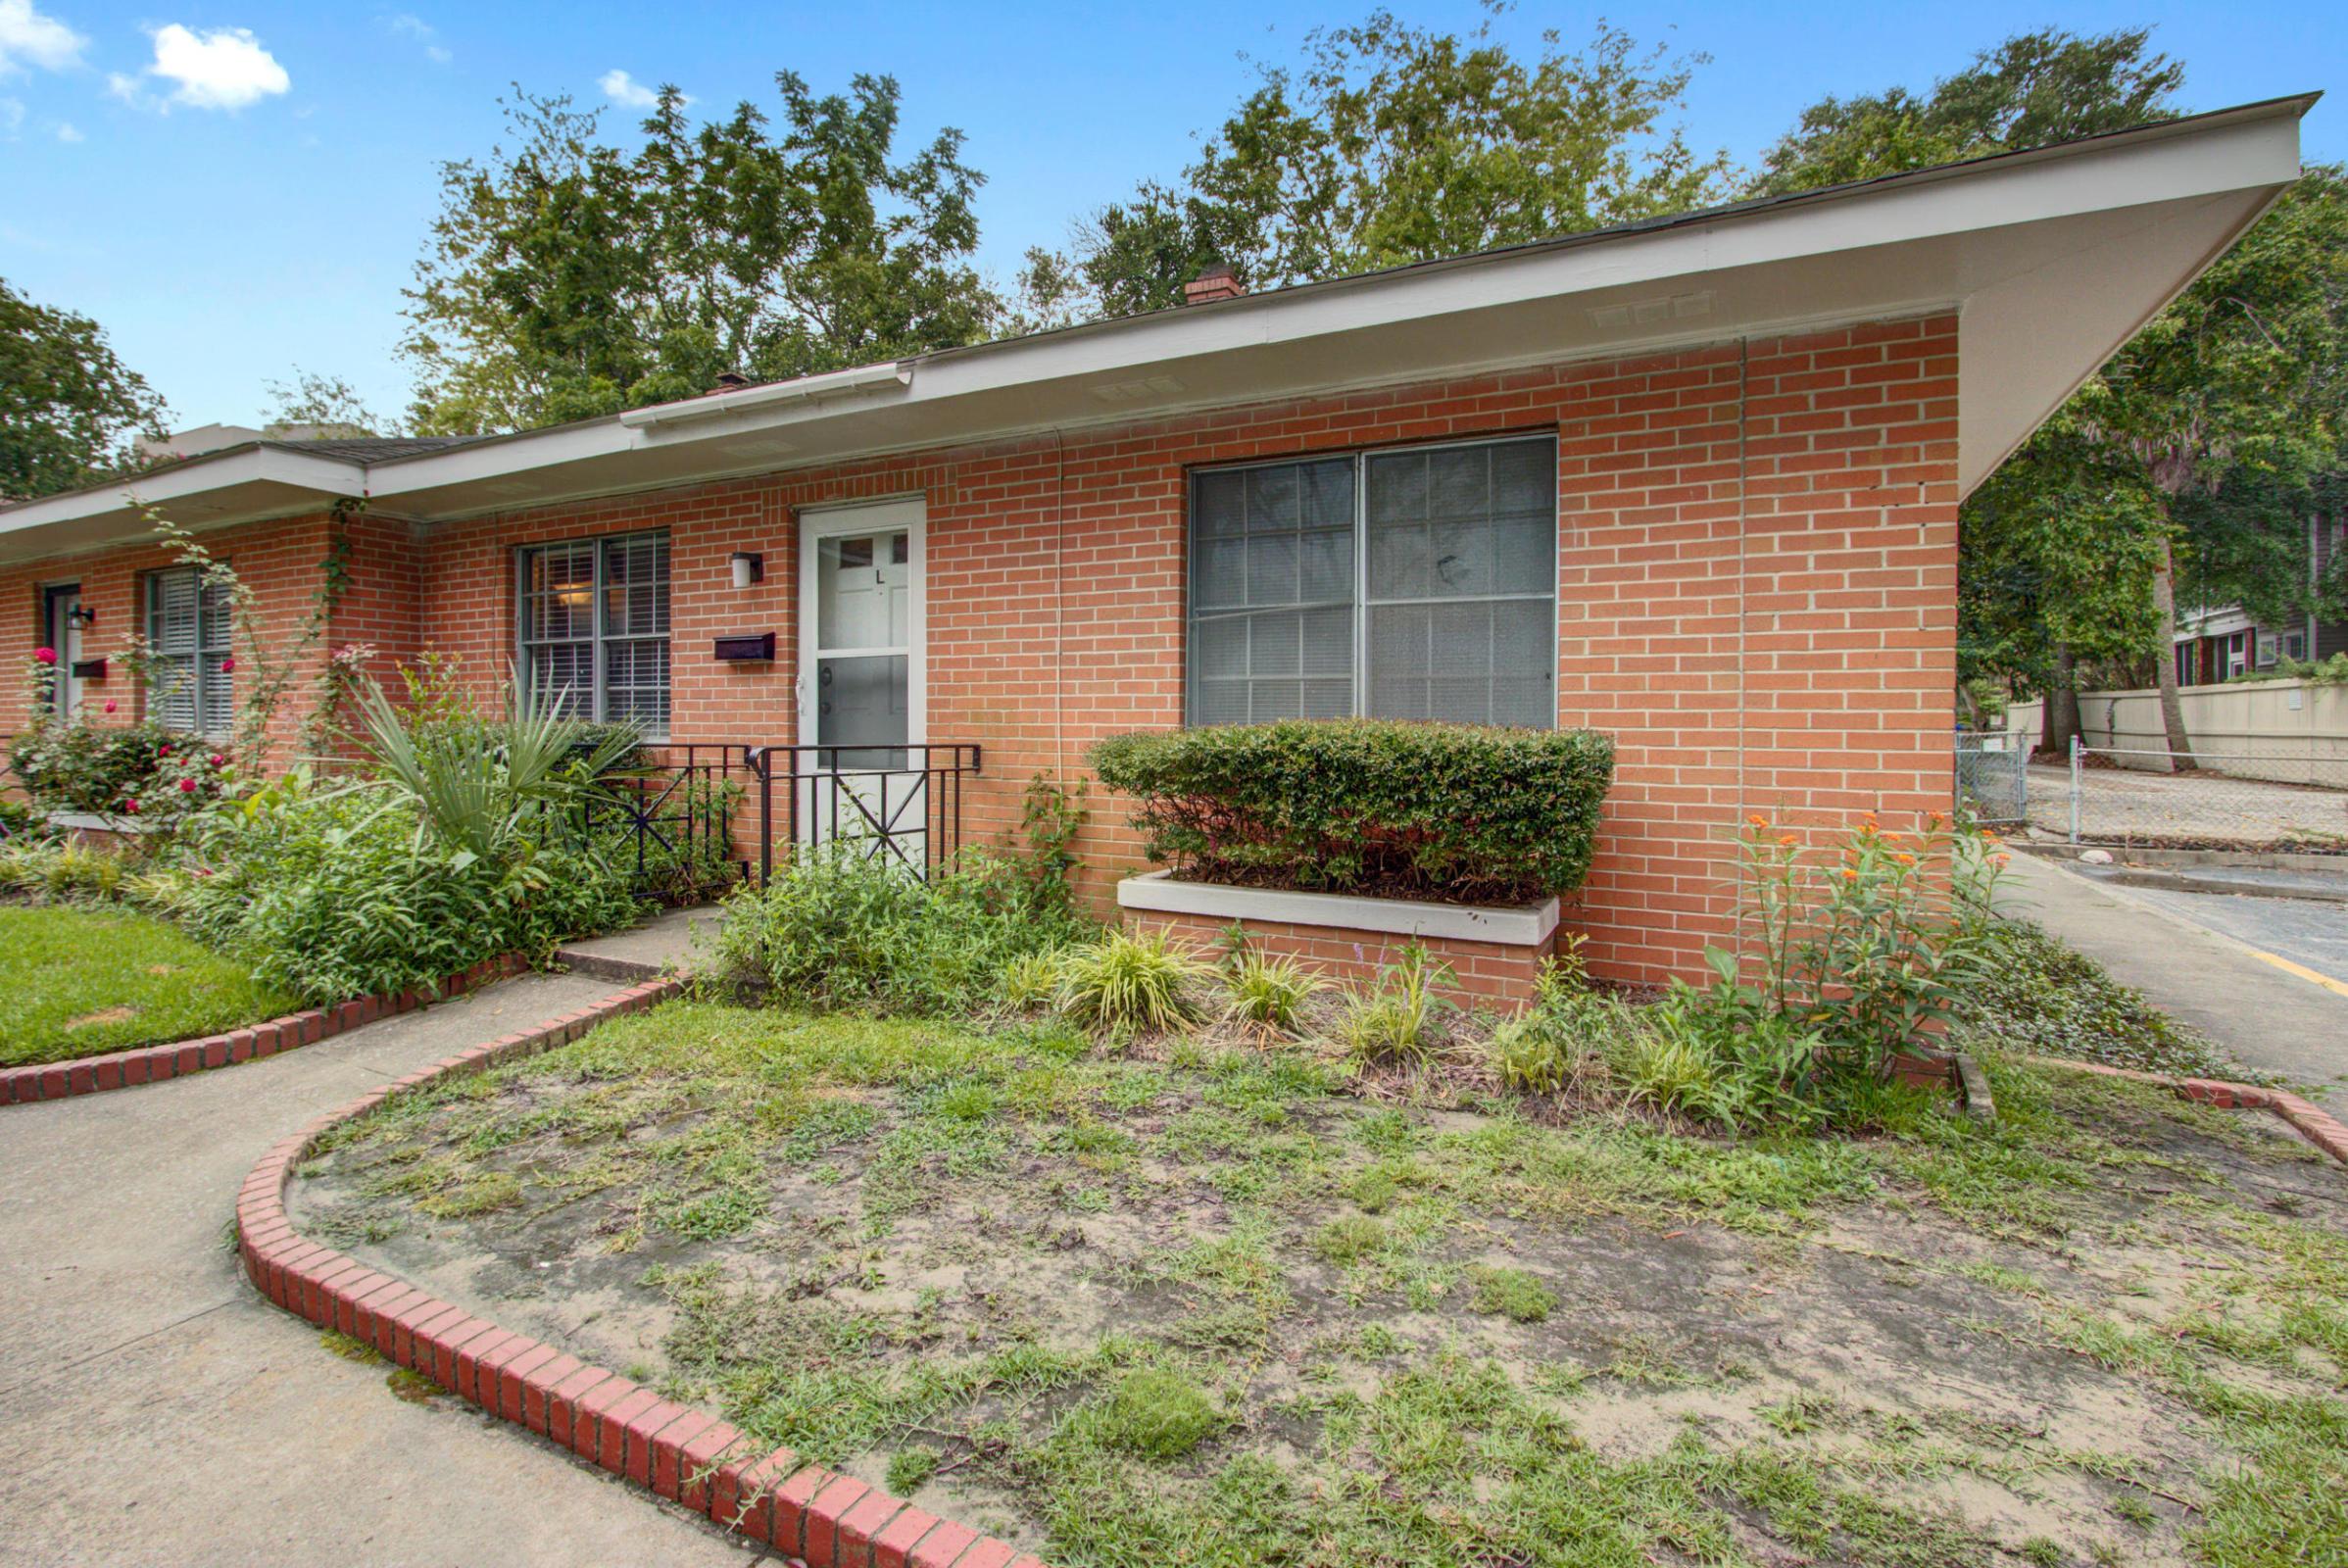 Rutledge Green Homes For Sale - 173 Rutledge, Charleston, SC - 24